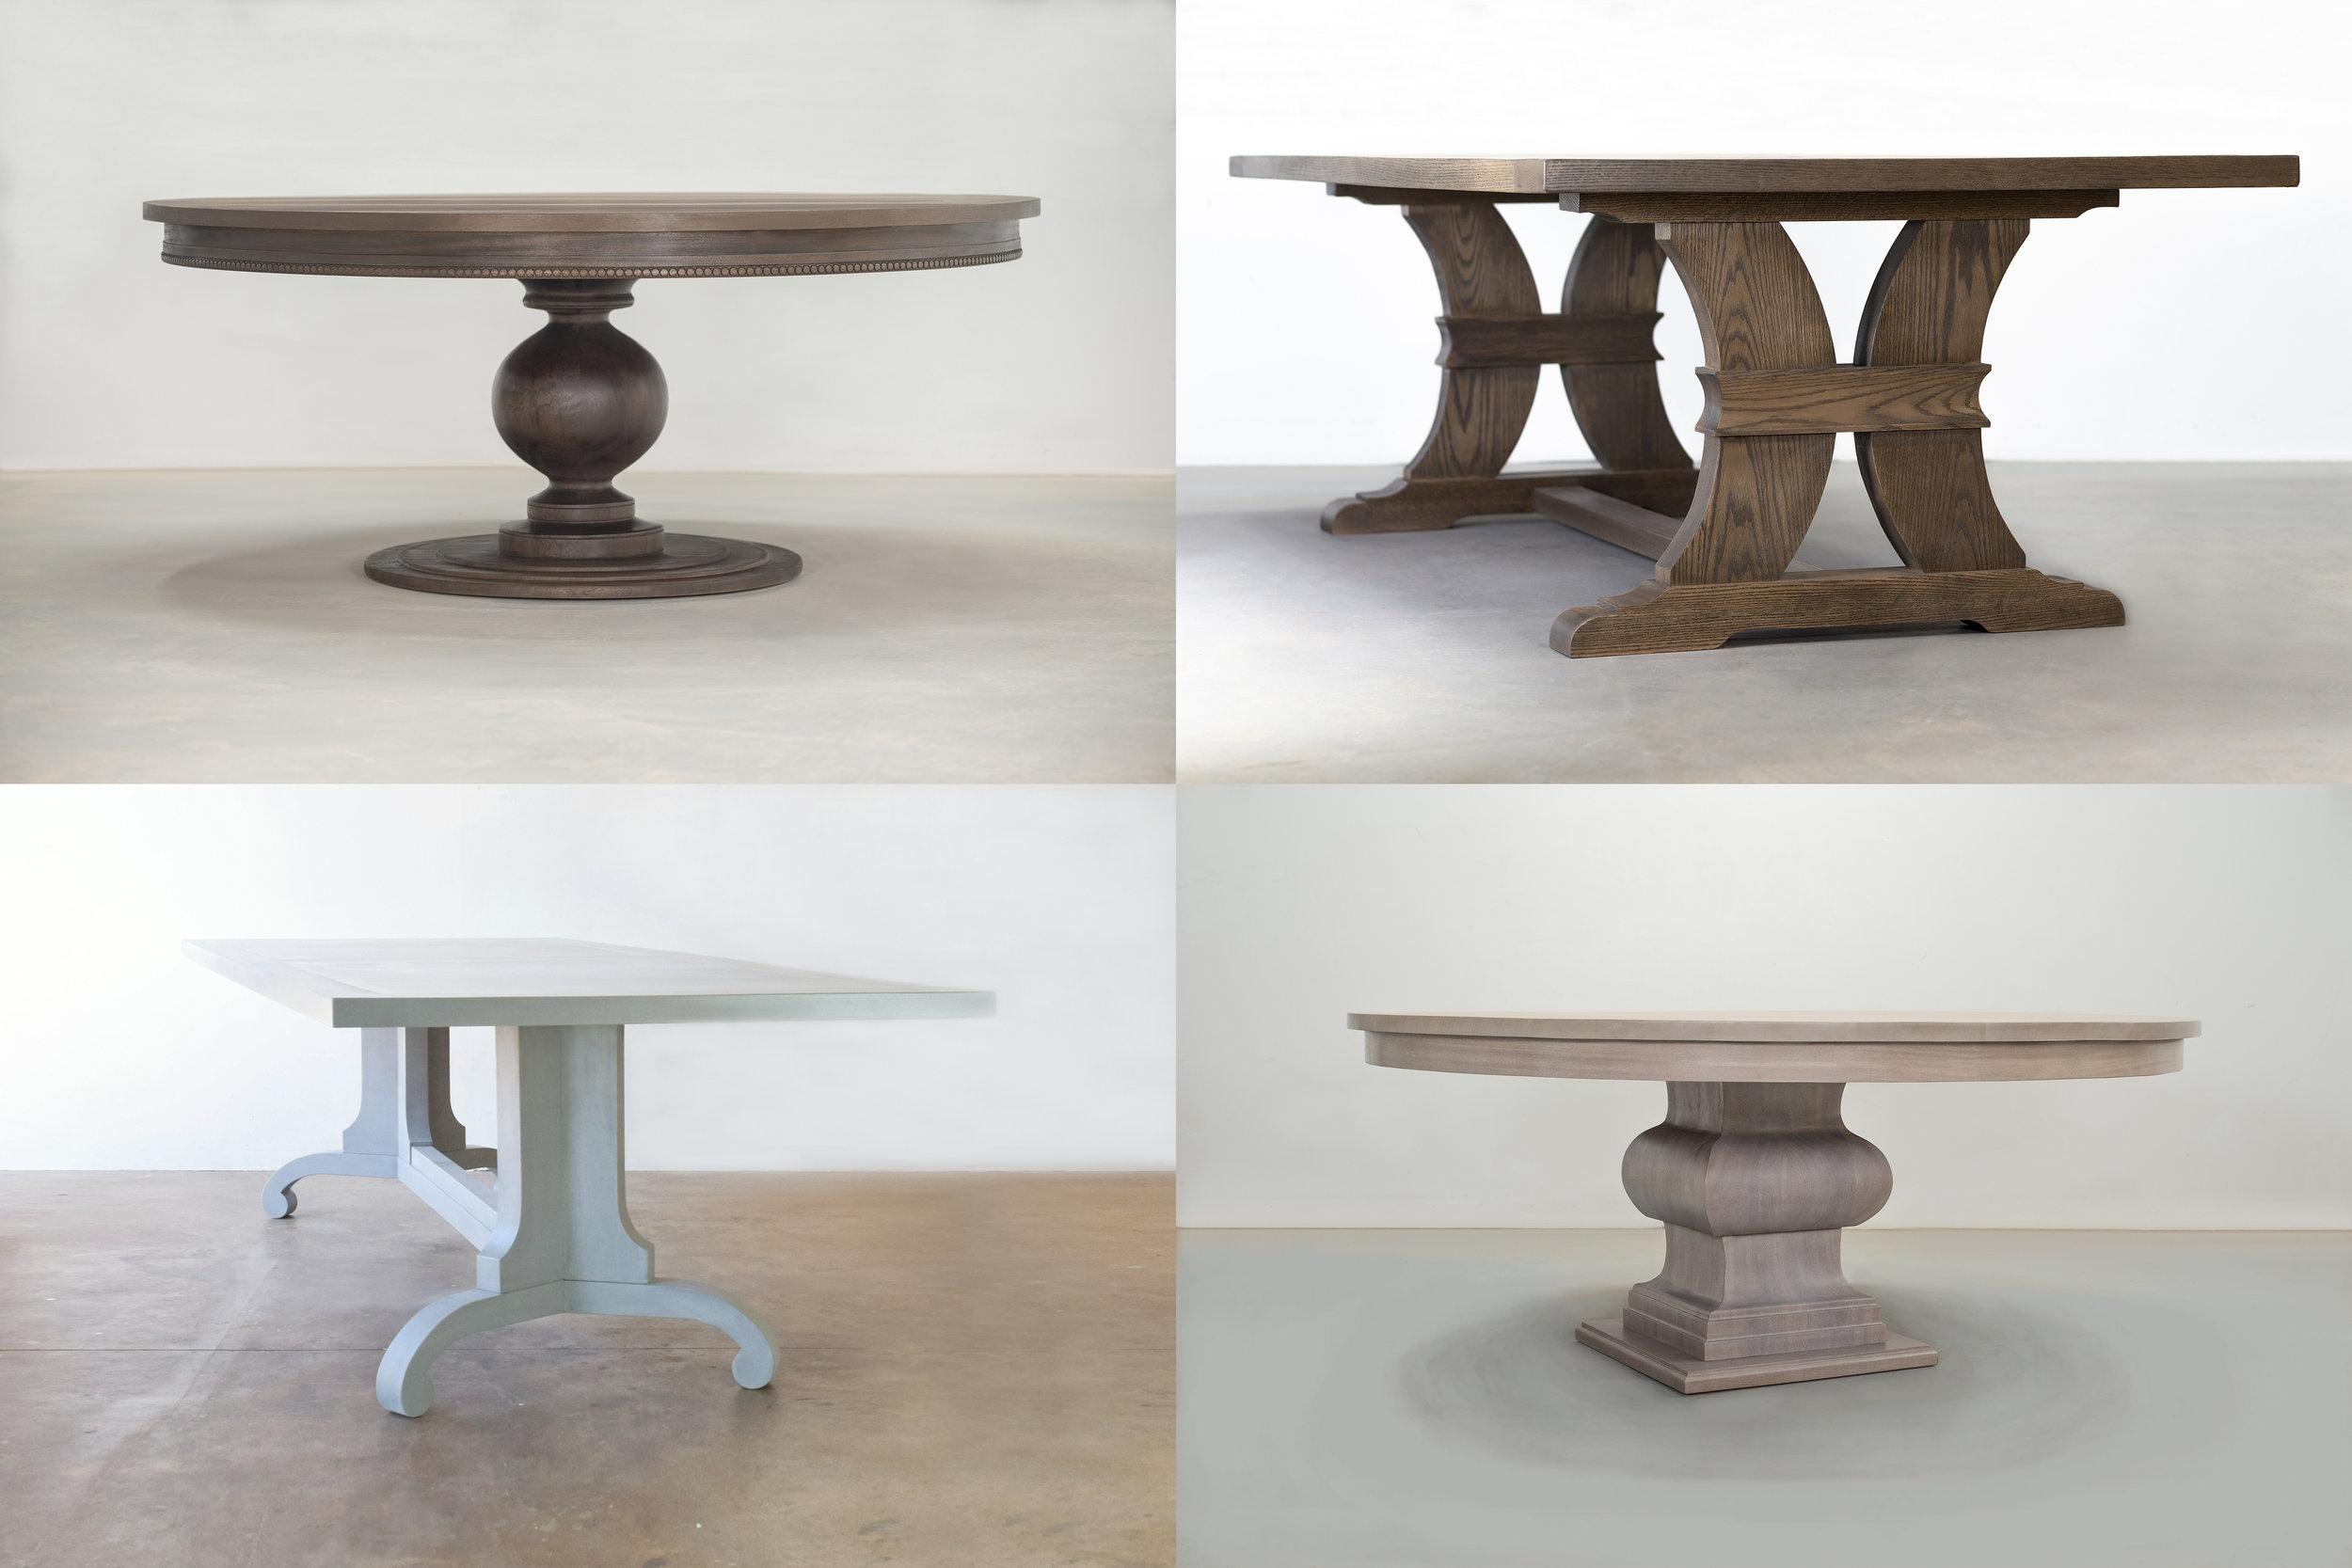 edmond-oklahoma-city-okc-tulsa-custom-rustic-reclaimed-furniture-modern-farmhouse-industrial-multi.jpg